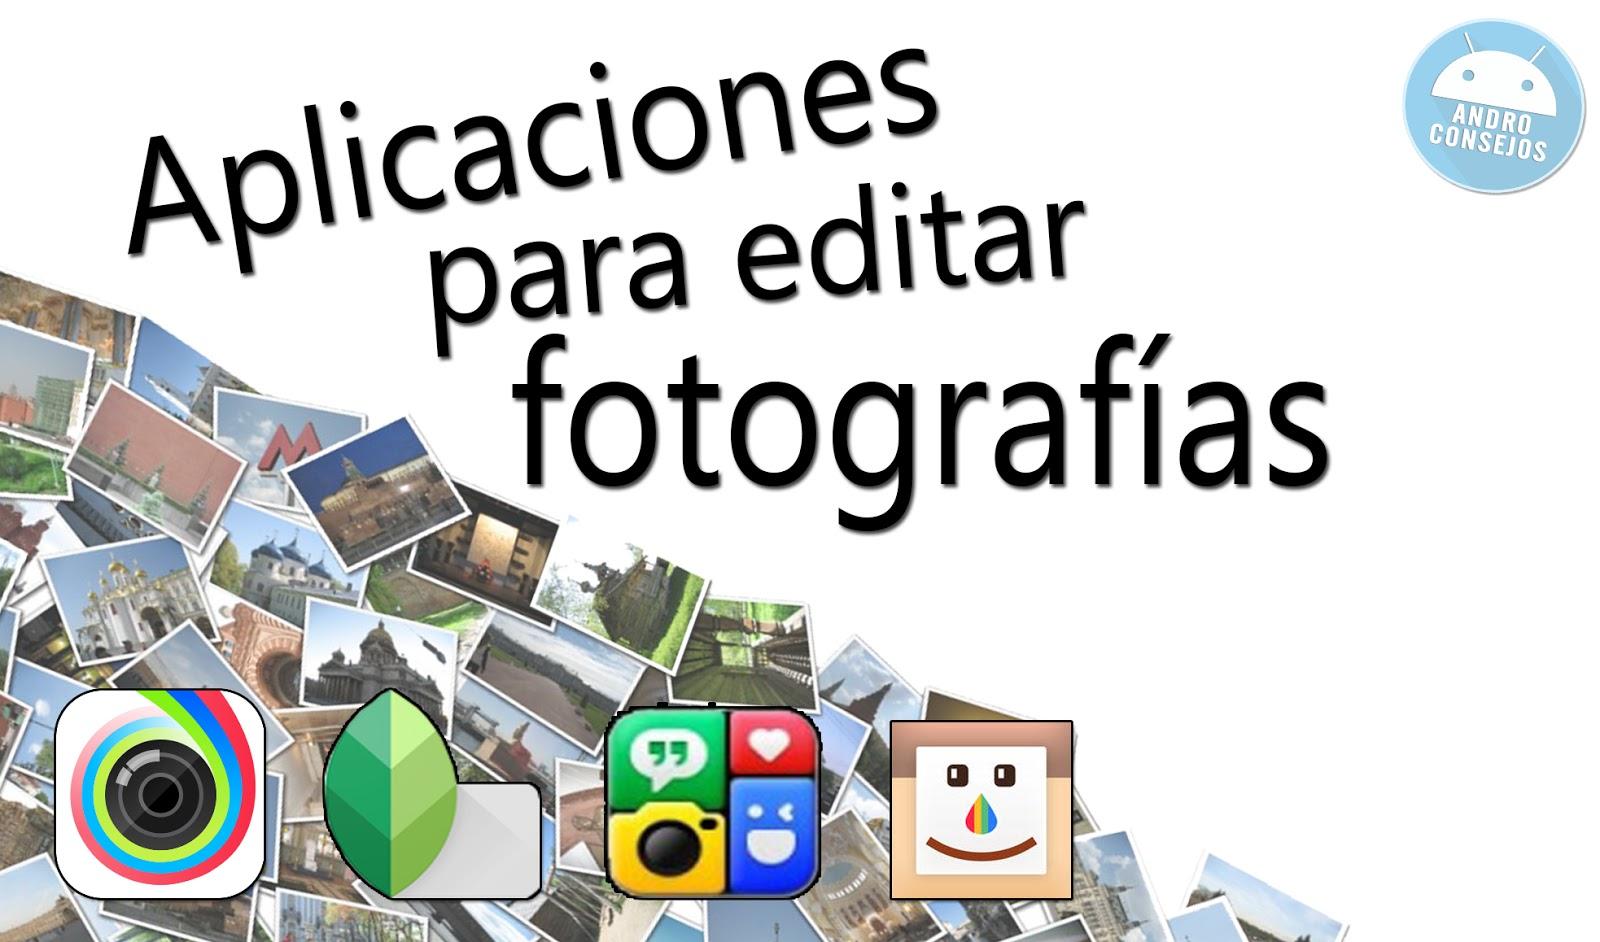 Recomendaci n de aplicaciones para editar fotograf as for Aplicaciones para disenar